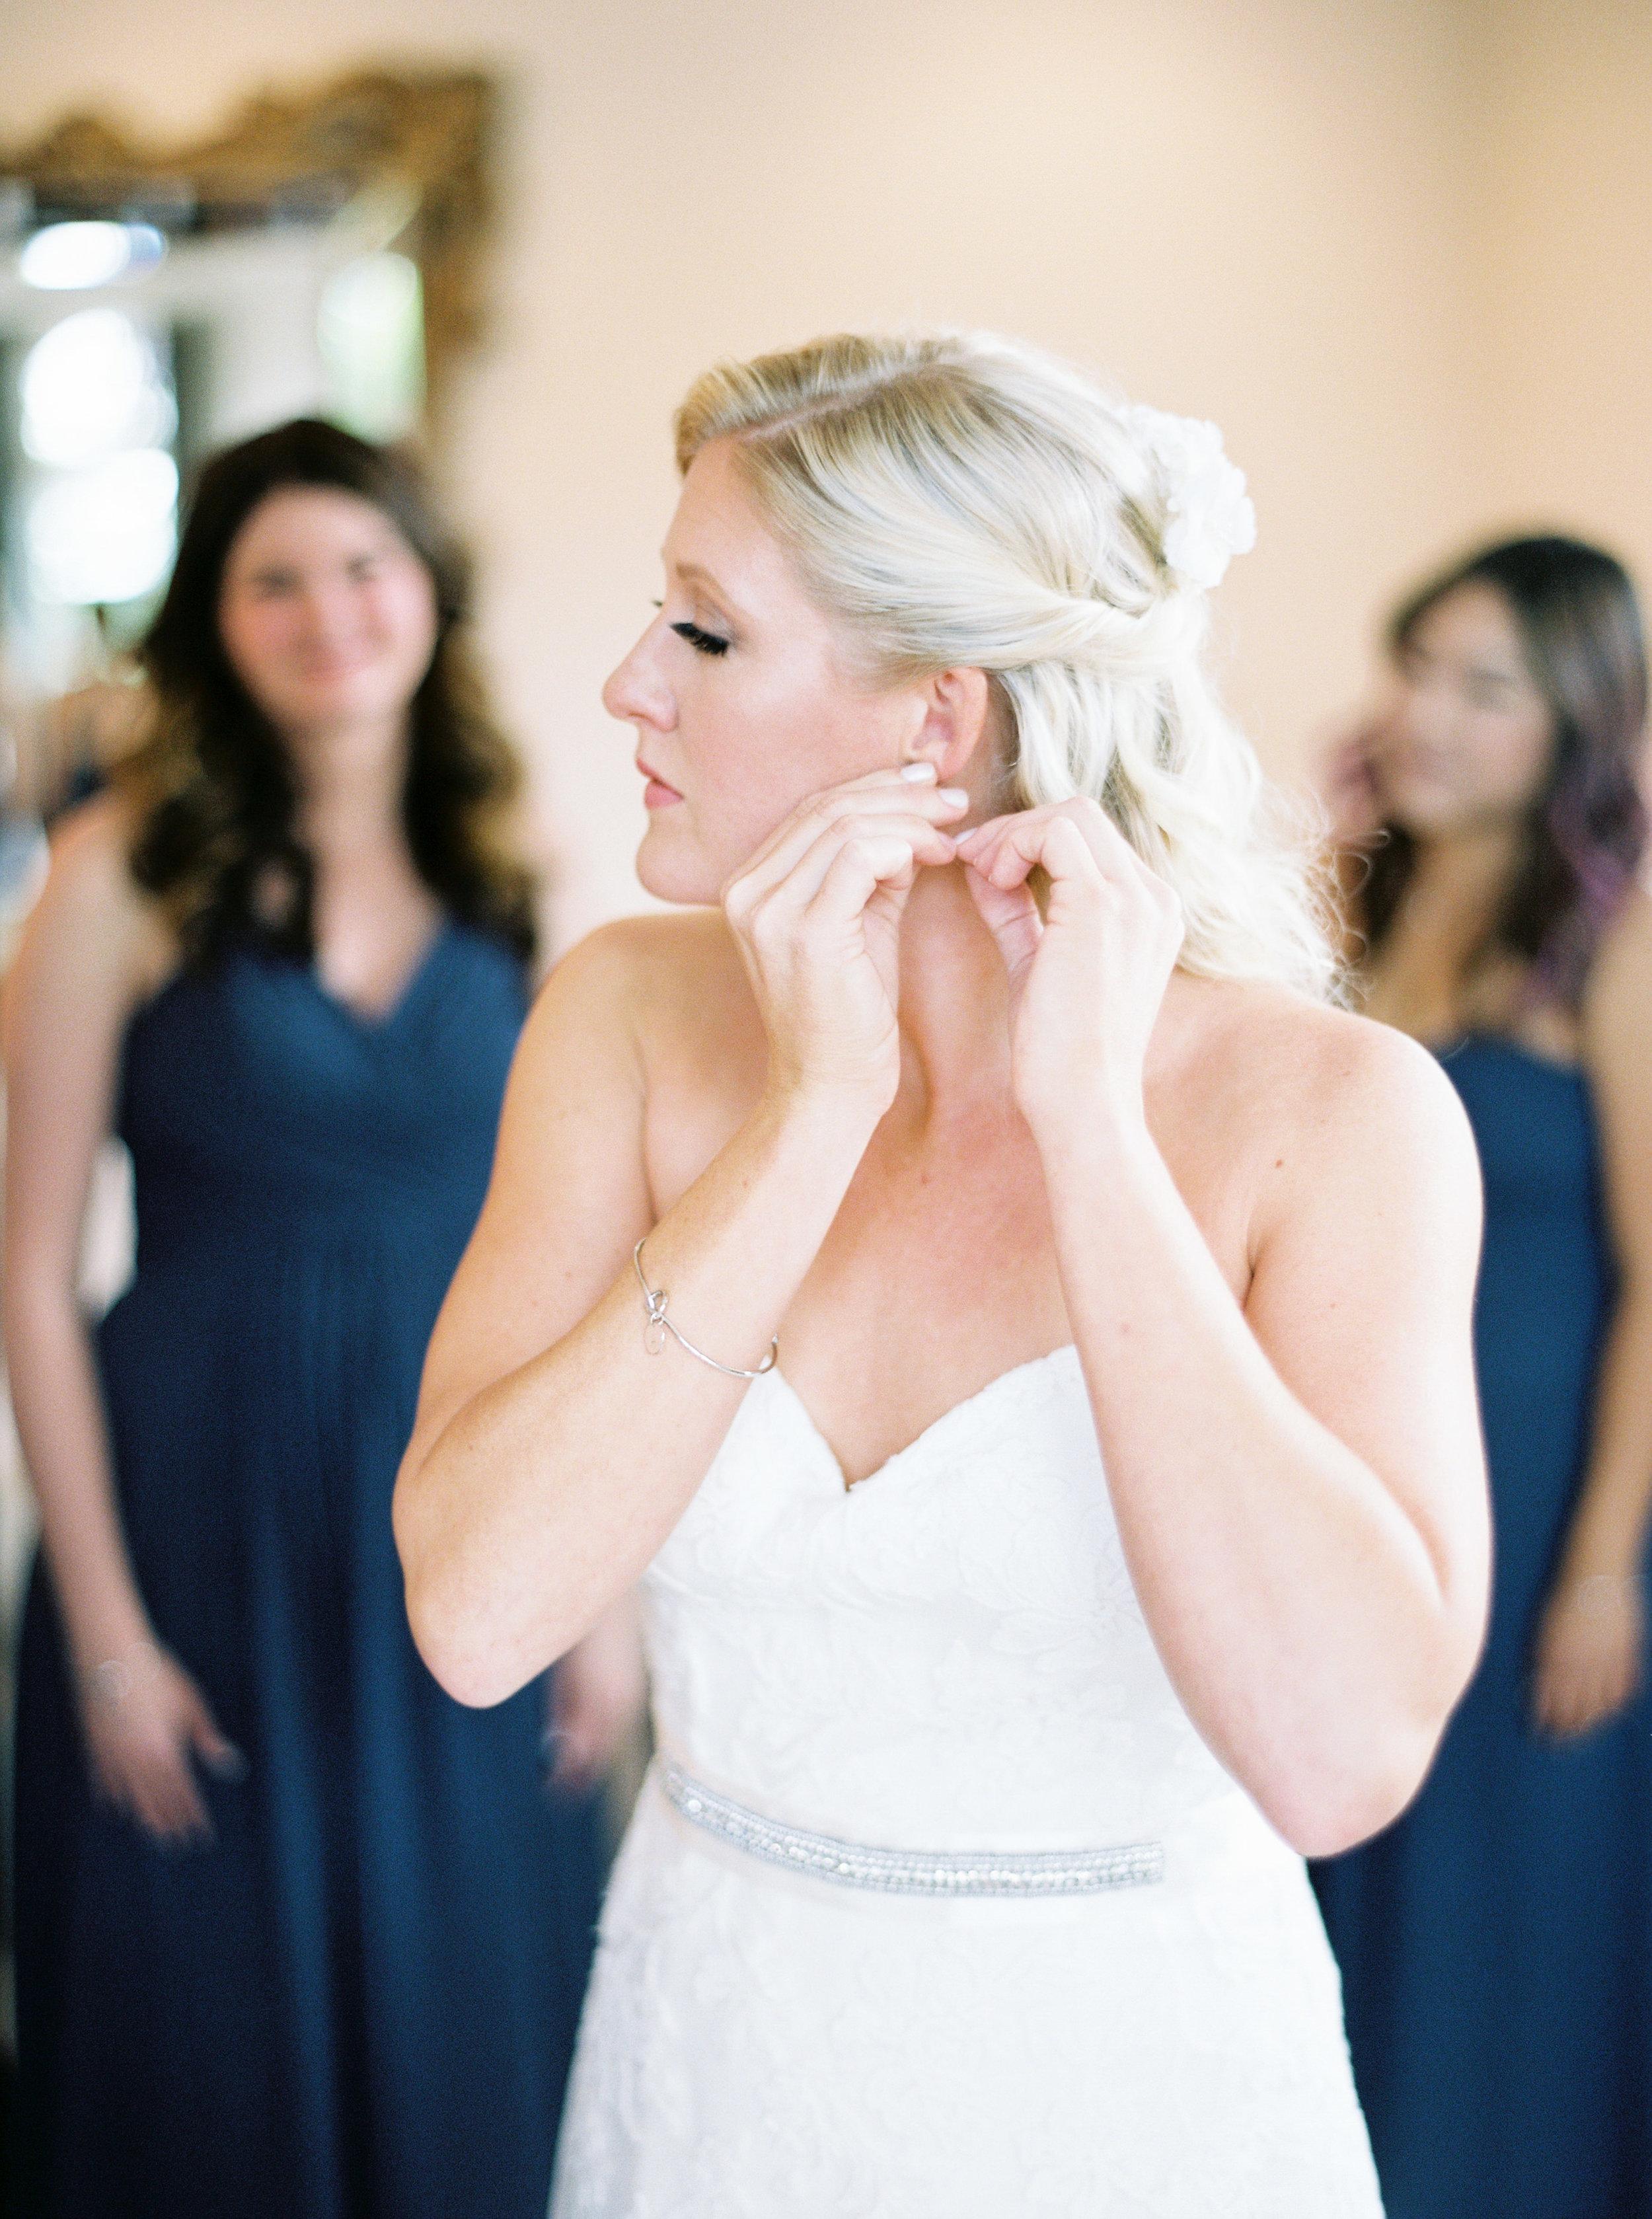 wolfe-heights-event-center-wedding-sacramento-california-wedding-86.jpg